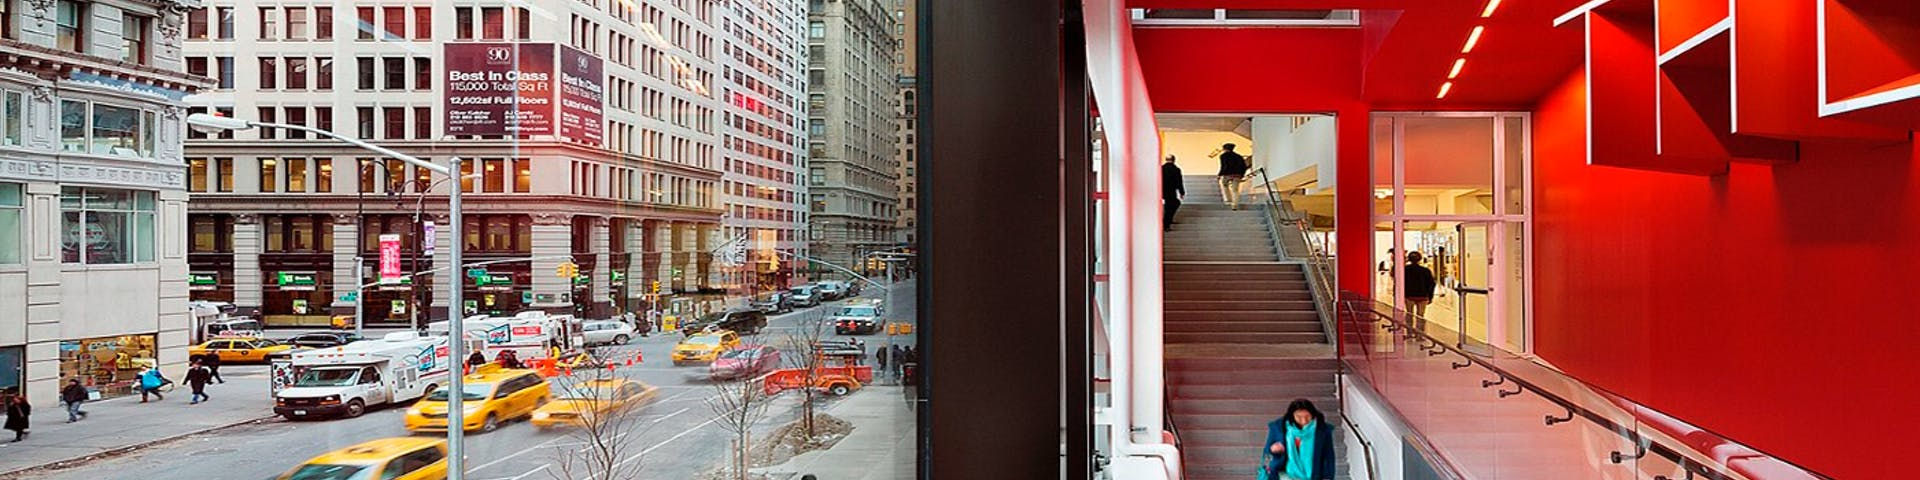 Parsons School Of Design The New School New York City United States Shortcoursesportal Com